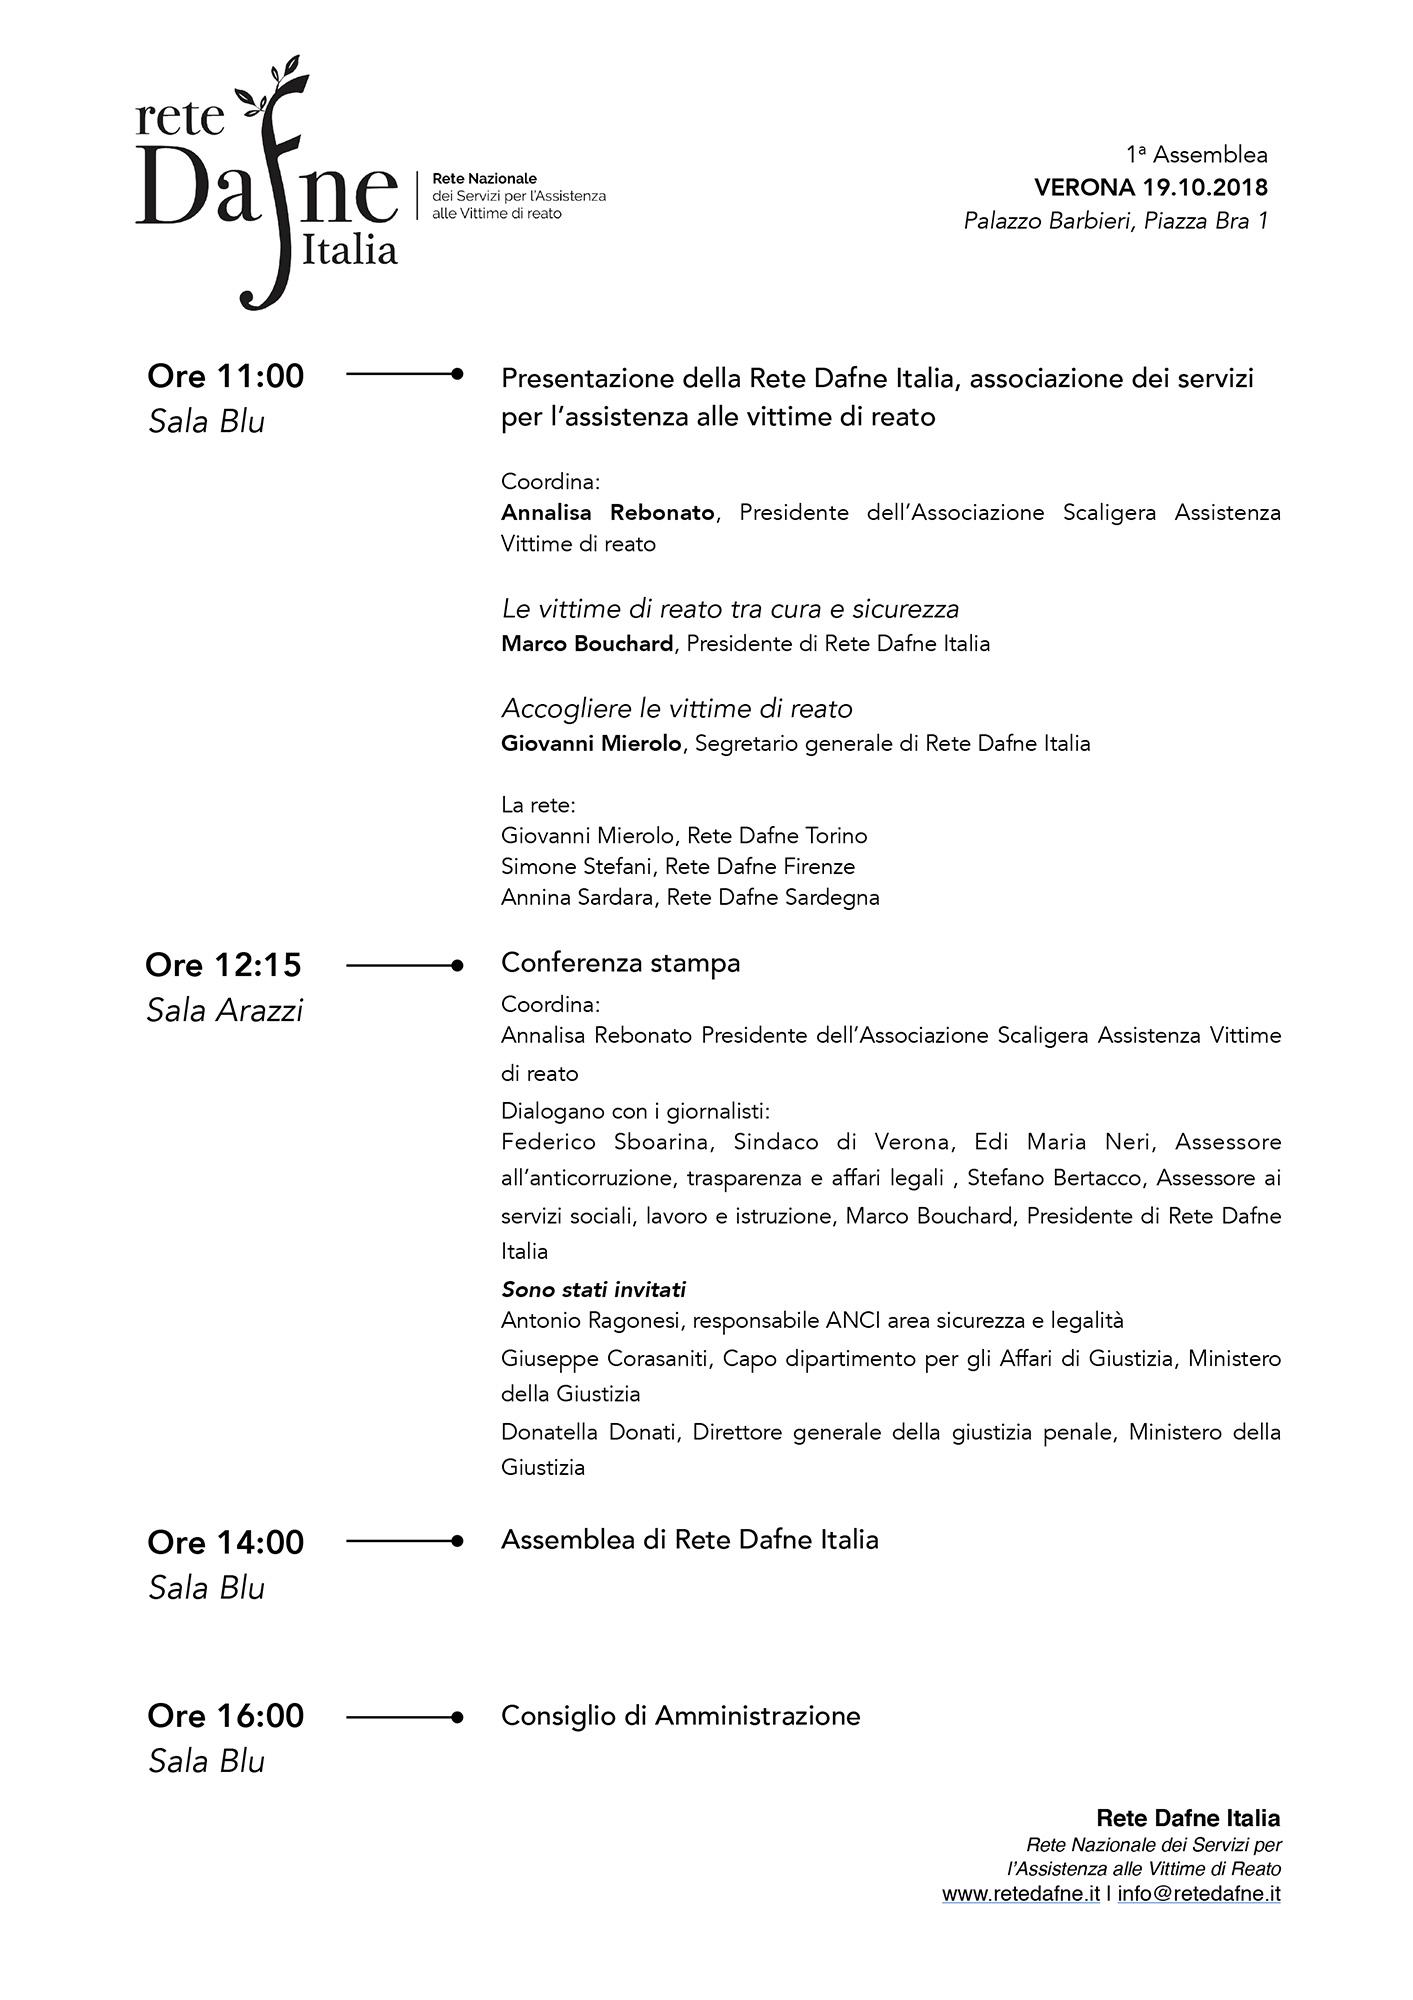 20181012_programma-definitivo-1-assemblea-rete-dafne-verona